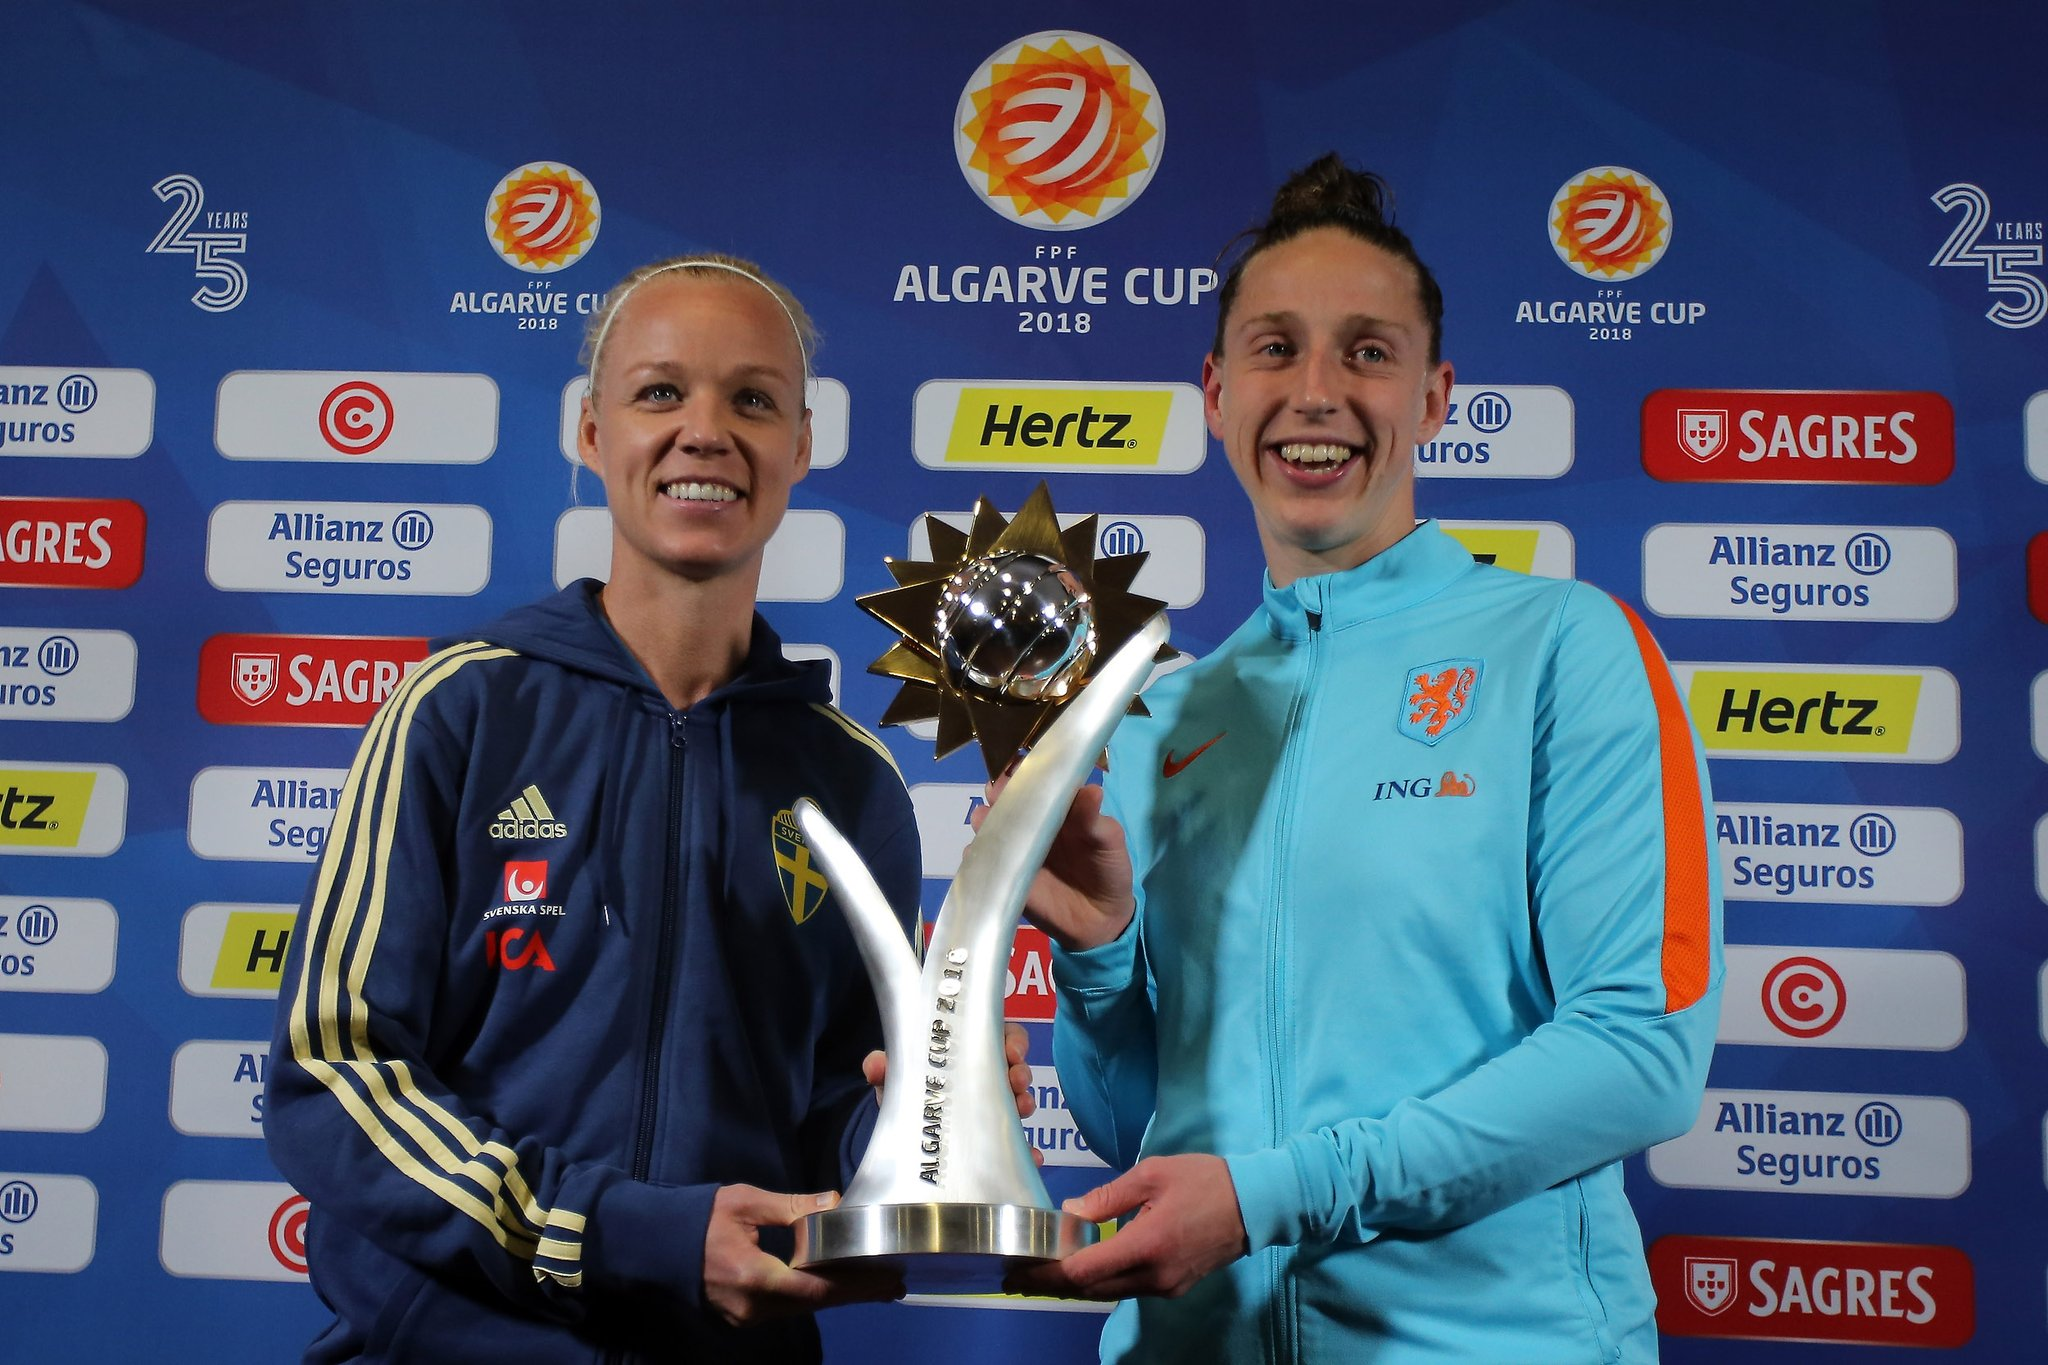 Caroline Seger et Sari van Veenendaal (photo Algarve Cup)